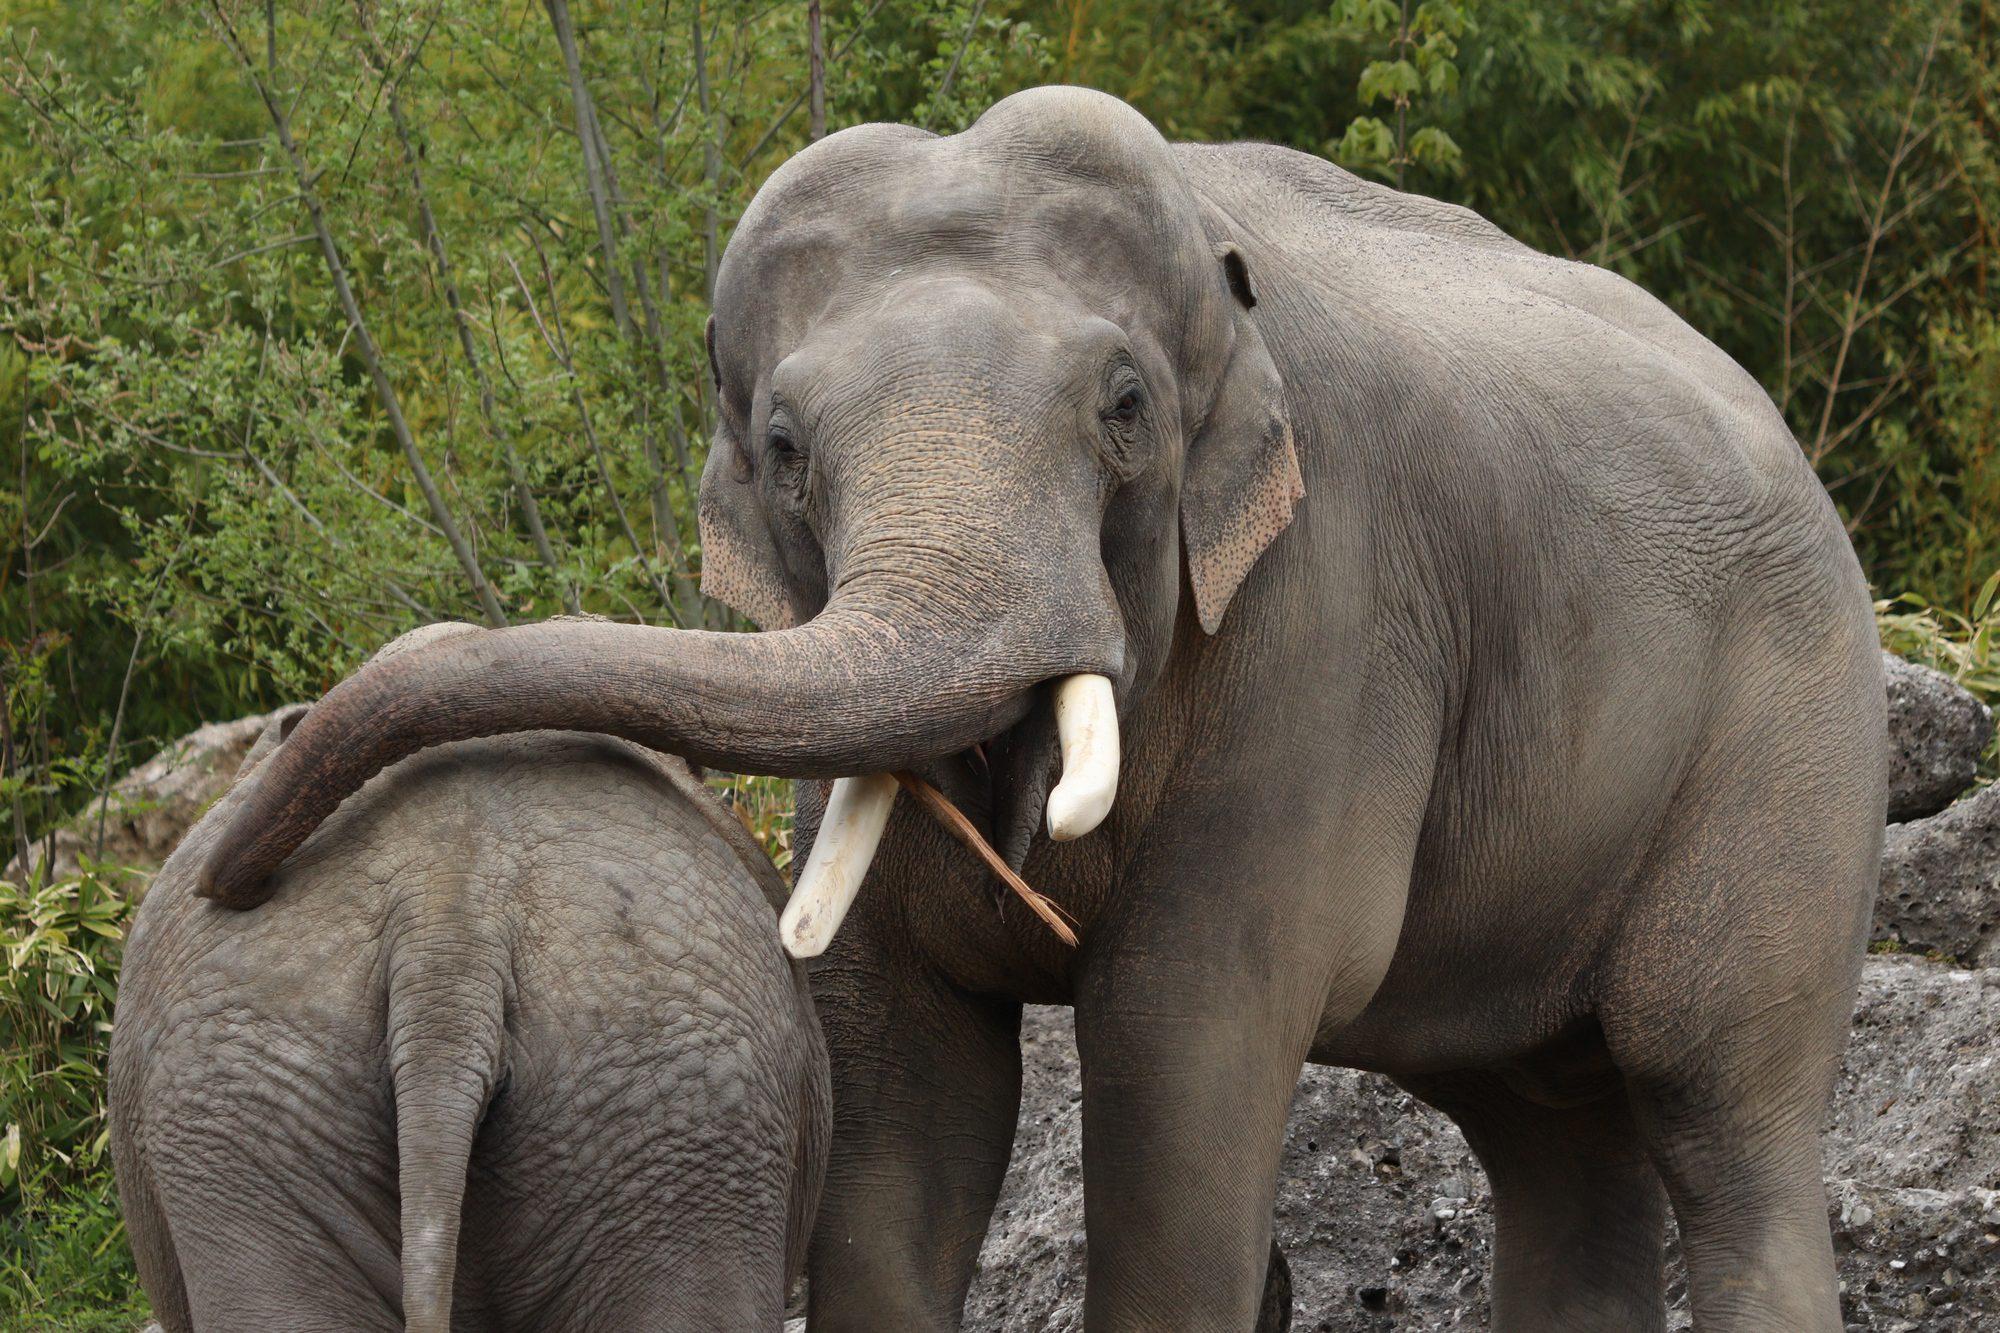 Asiatische Elefanten Gajendra und Panang im Tierpark Hellabrunn